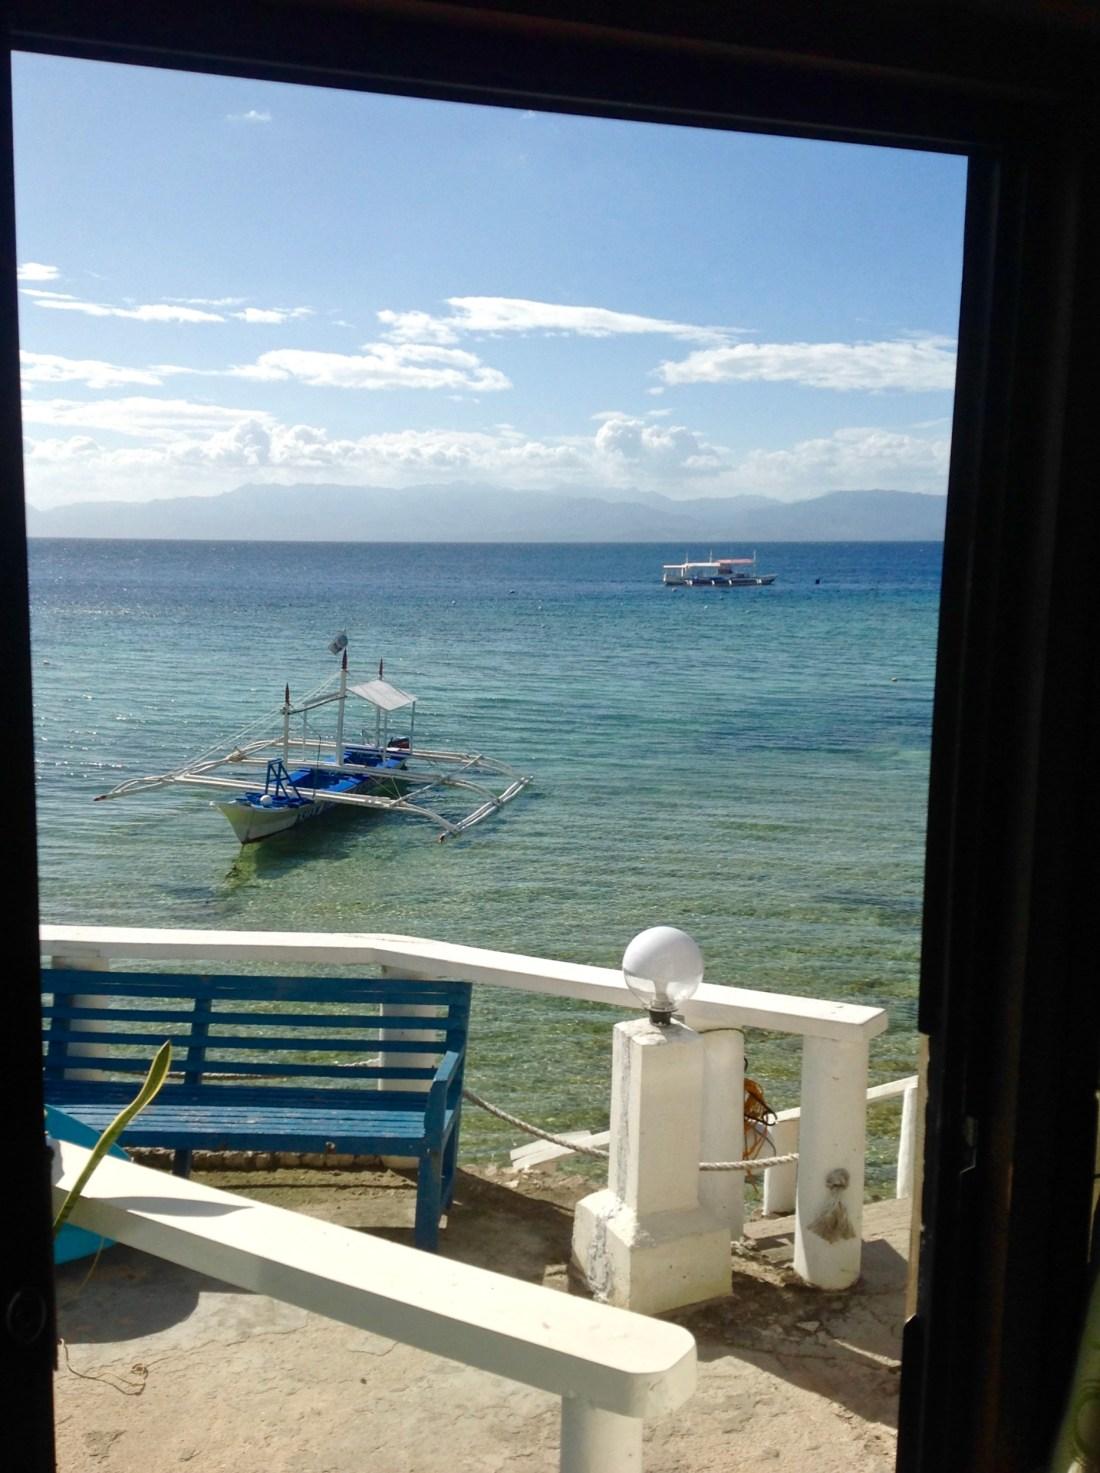 Snorkelling, diving, moalboal, asian Belgian resort moalboal, Cebu, Philippines, image by Jade Jackson